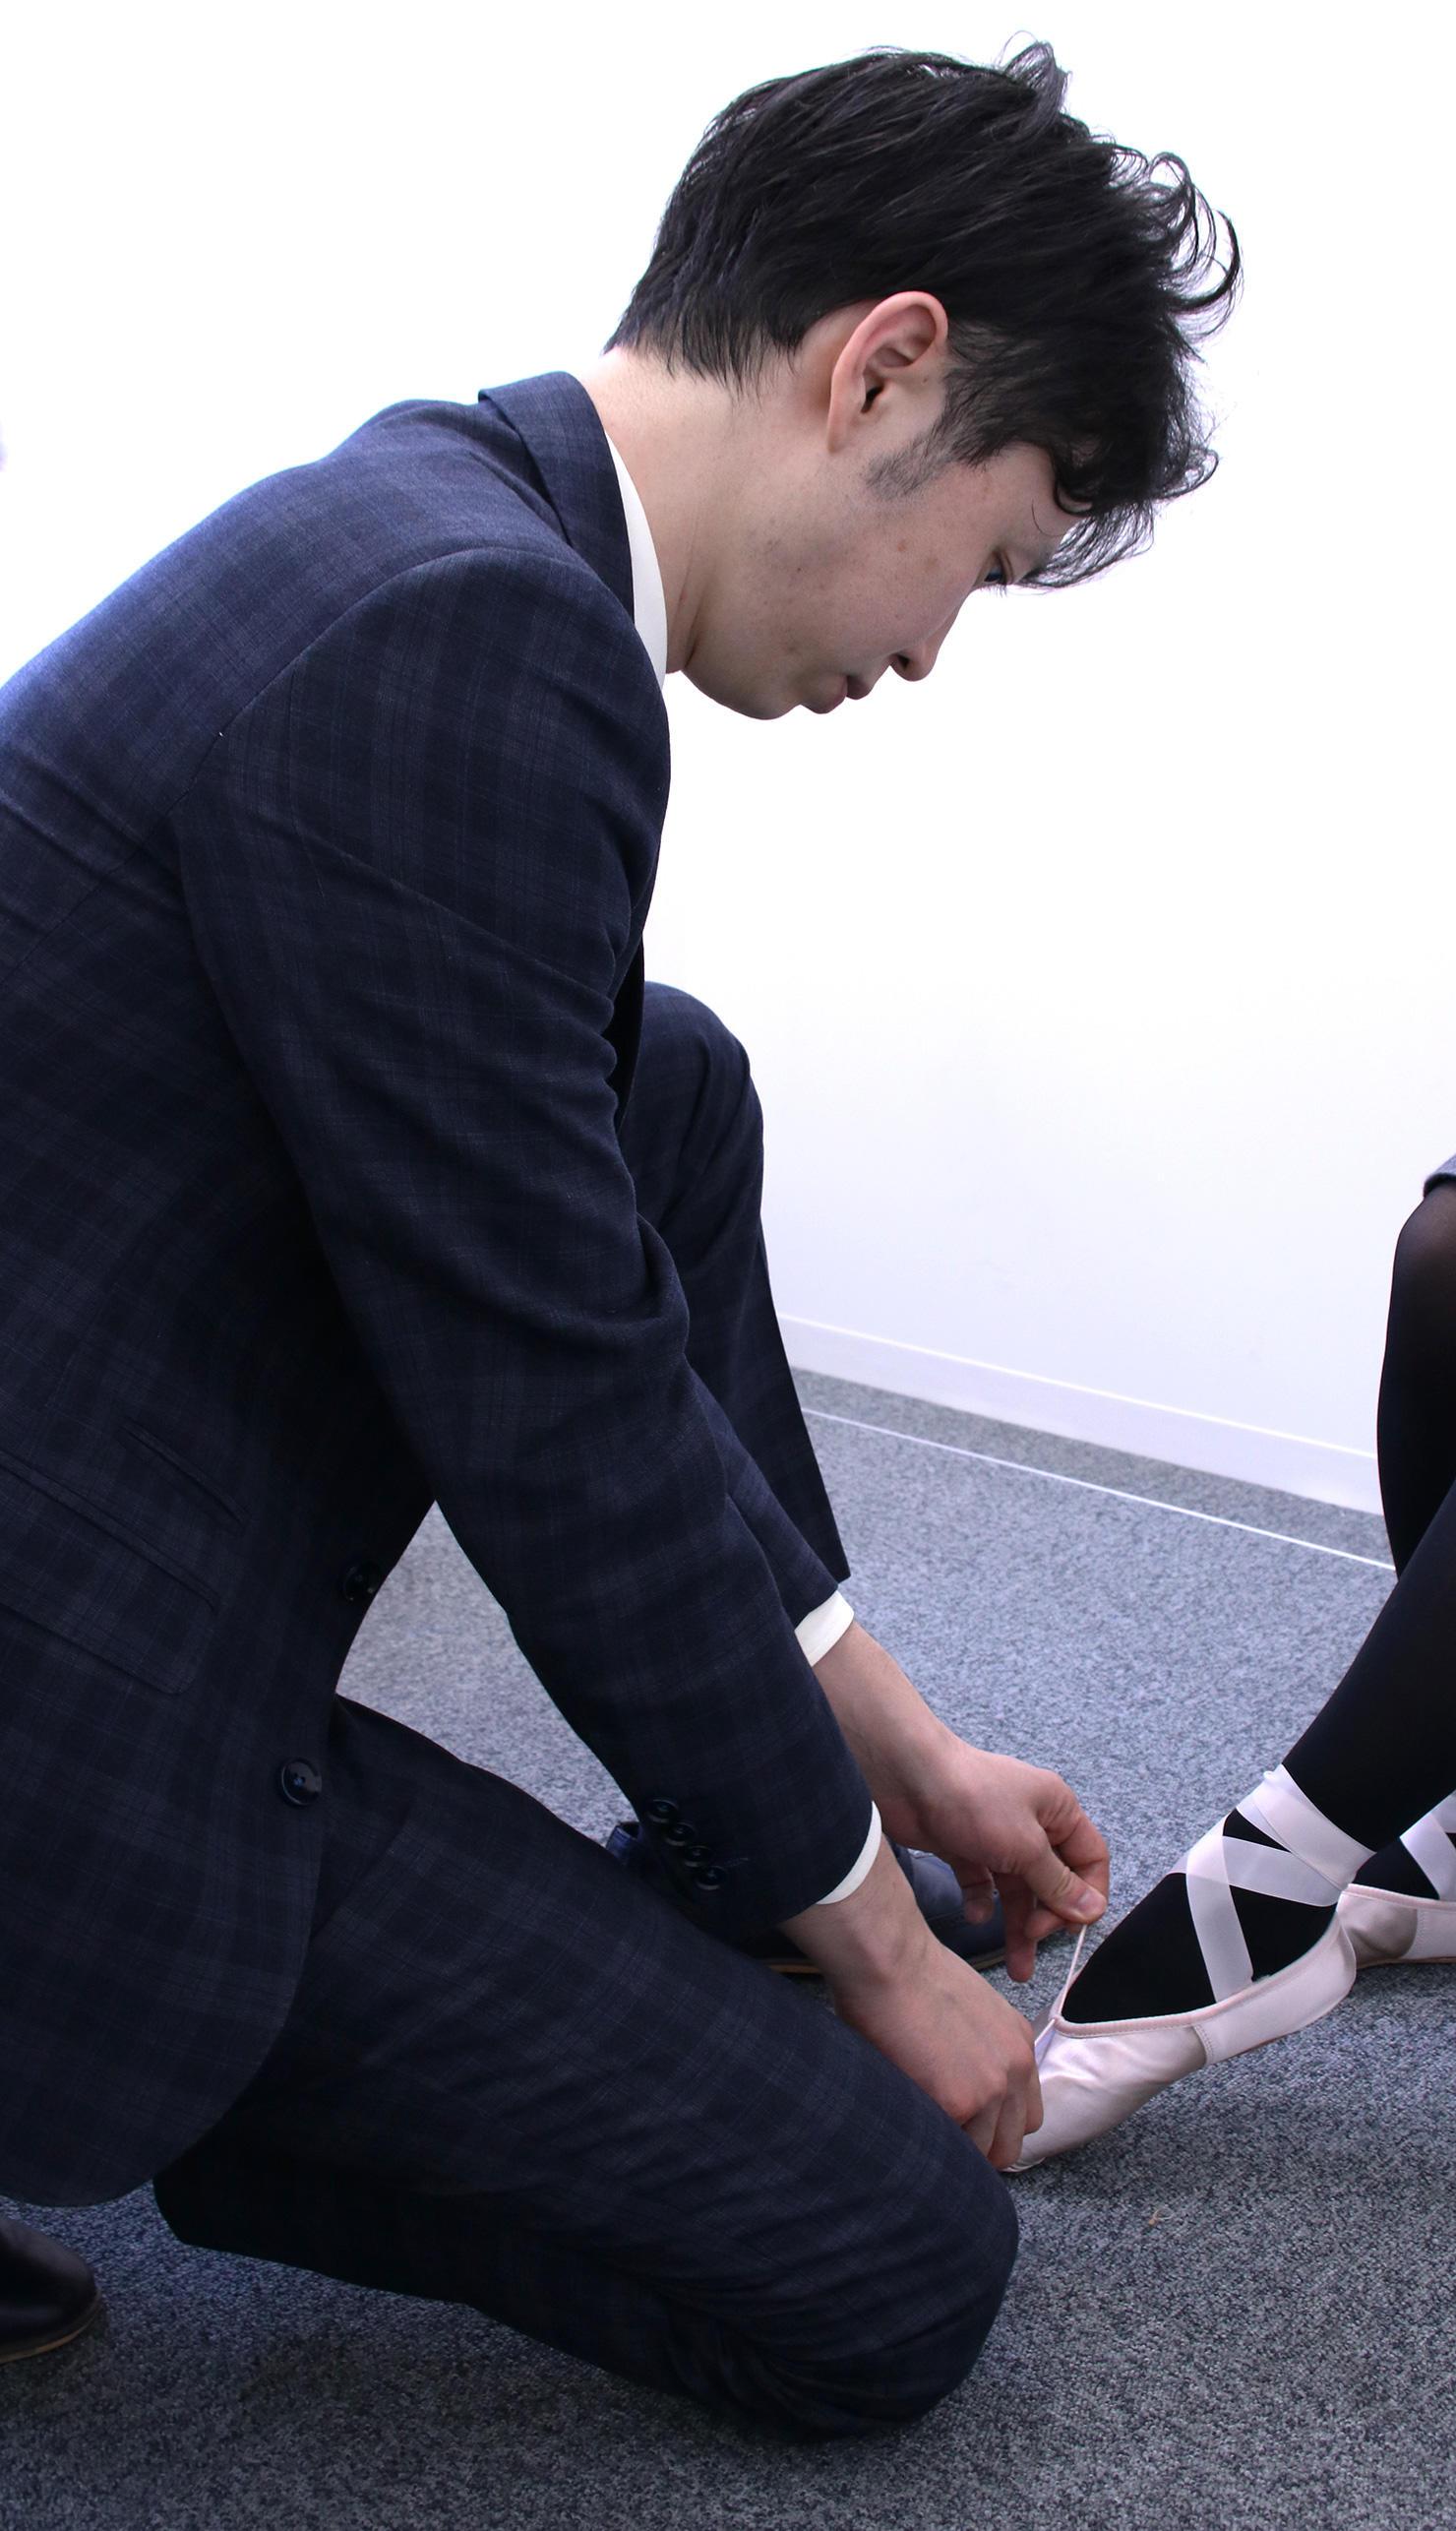 interview_sunaga_003.jpg